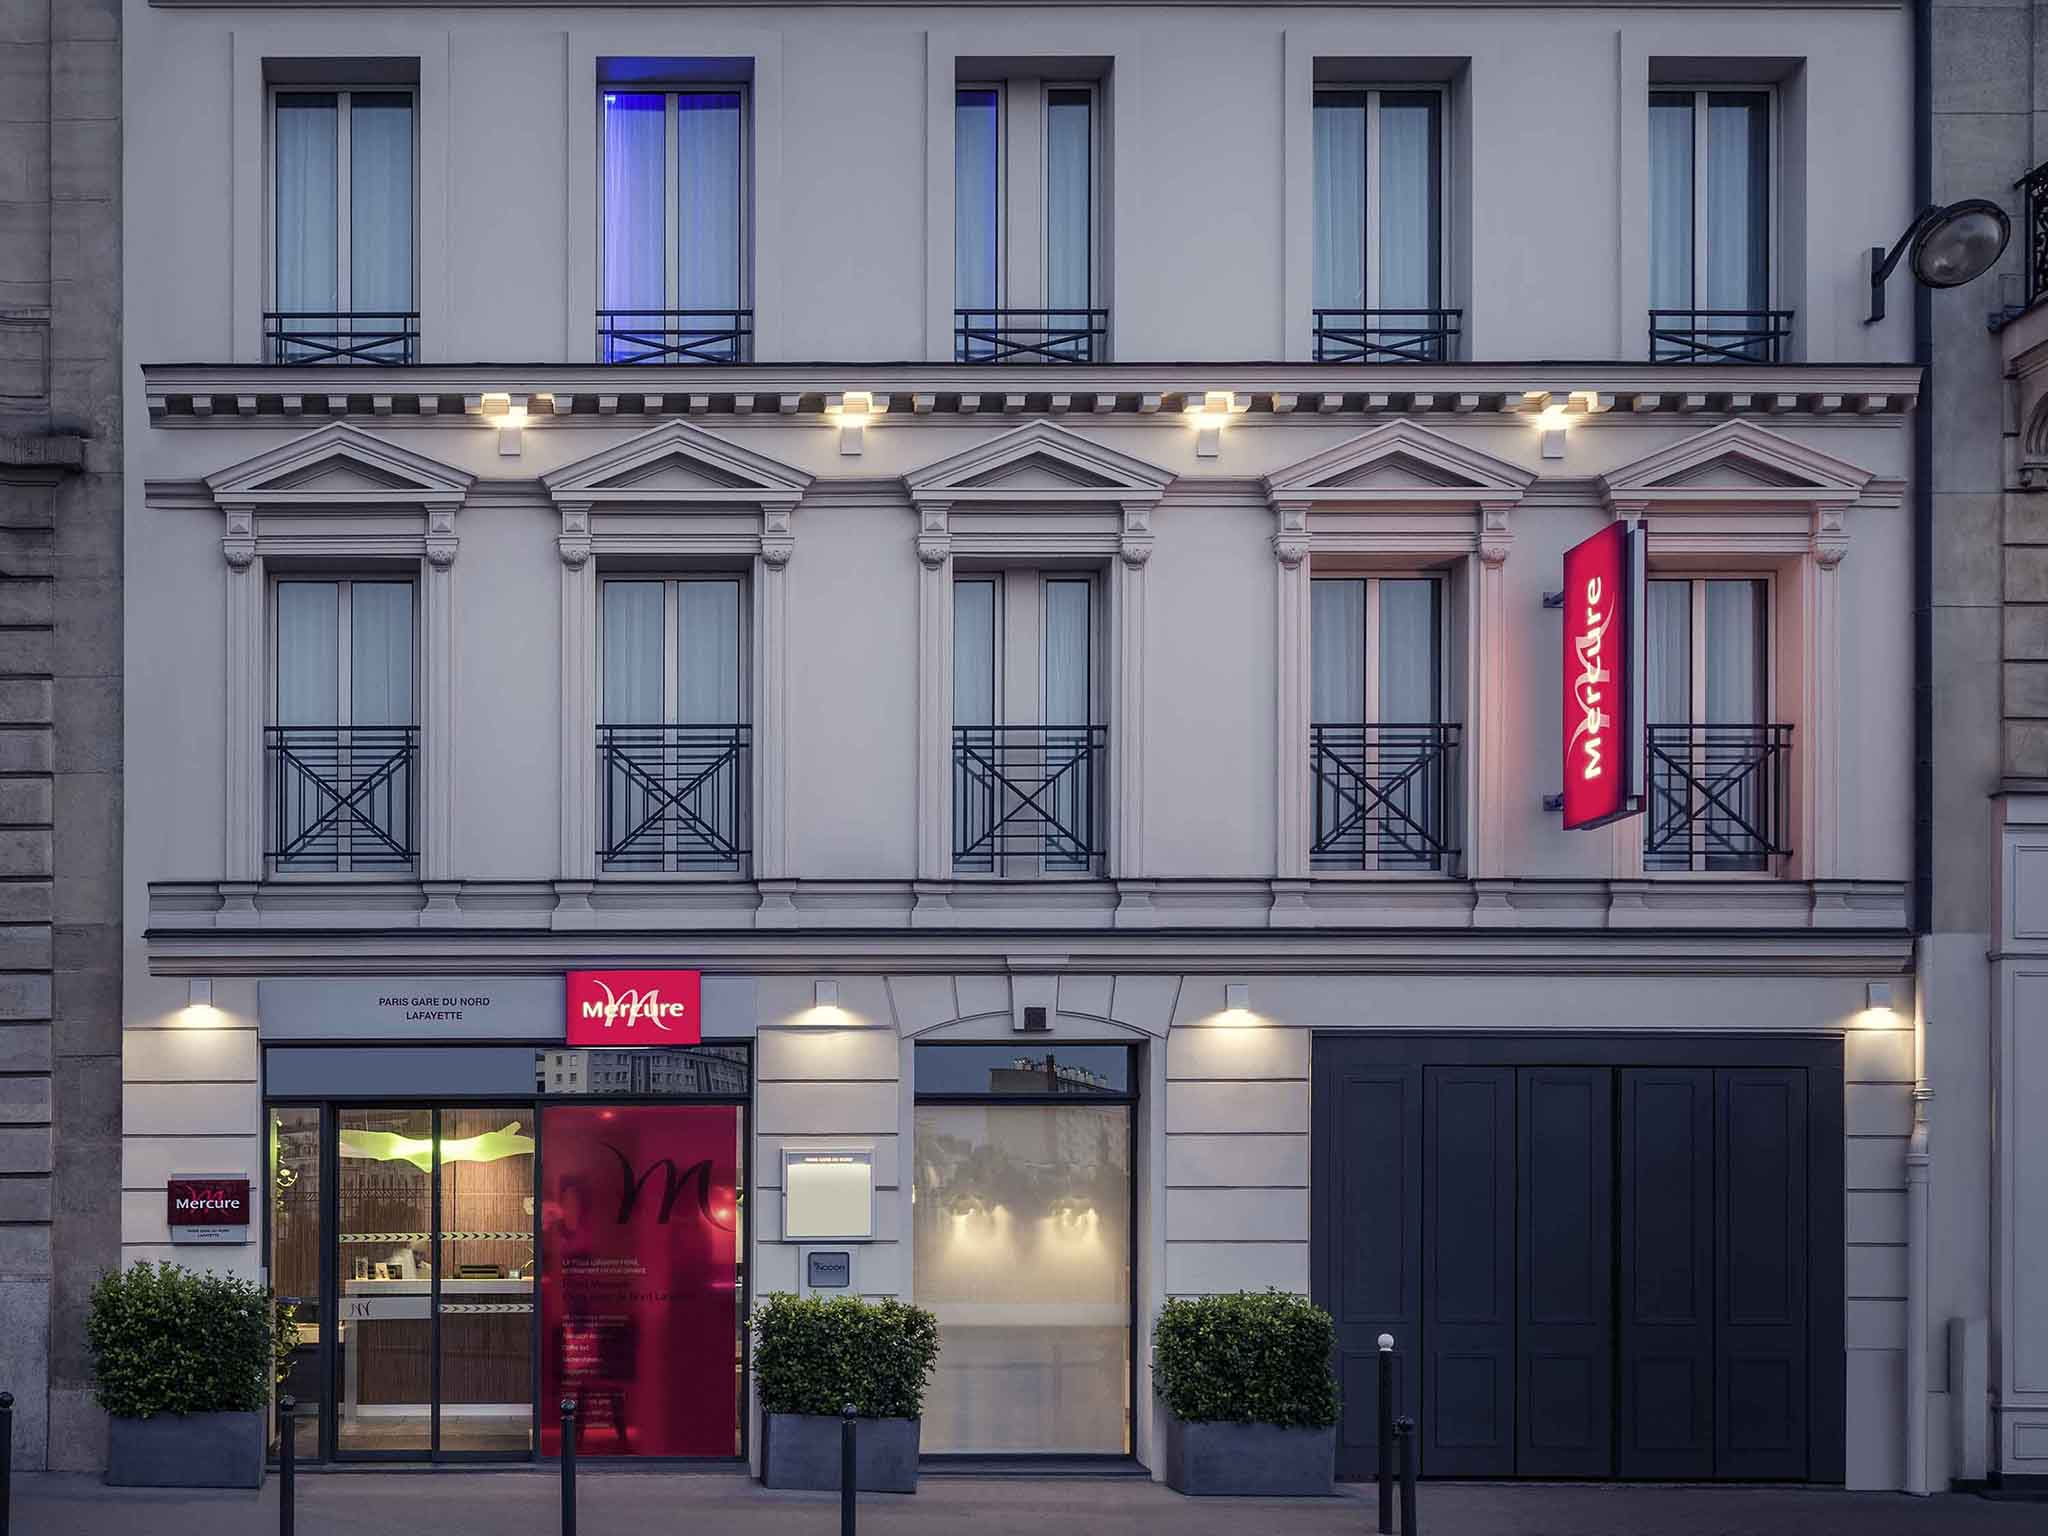 hotel in paris mercure paris gare du nord la fayette hotel. Black Bedroom Furniture Sets. Home Design Ideas